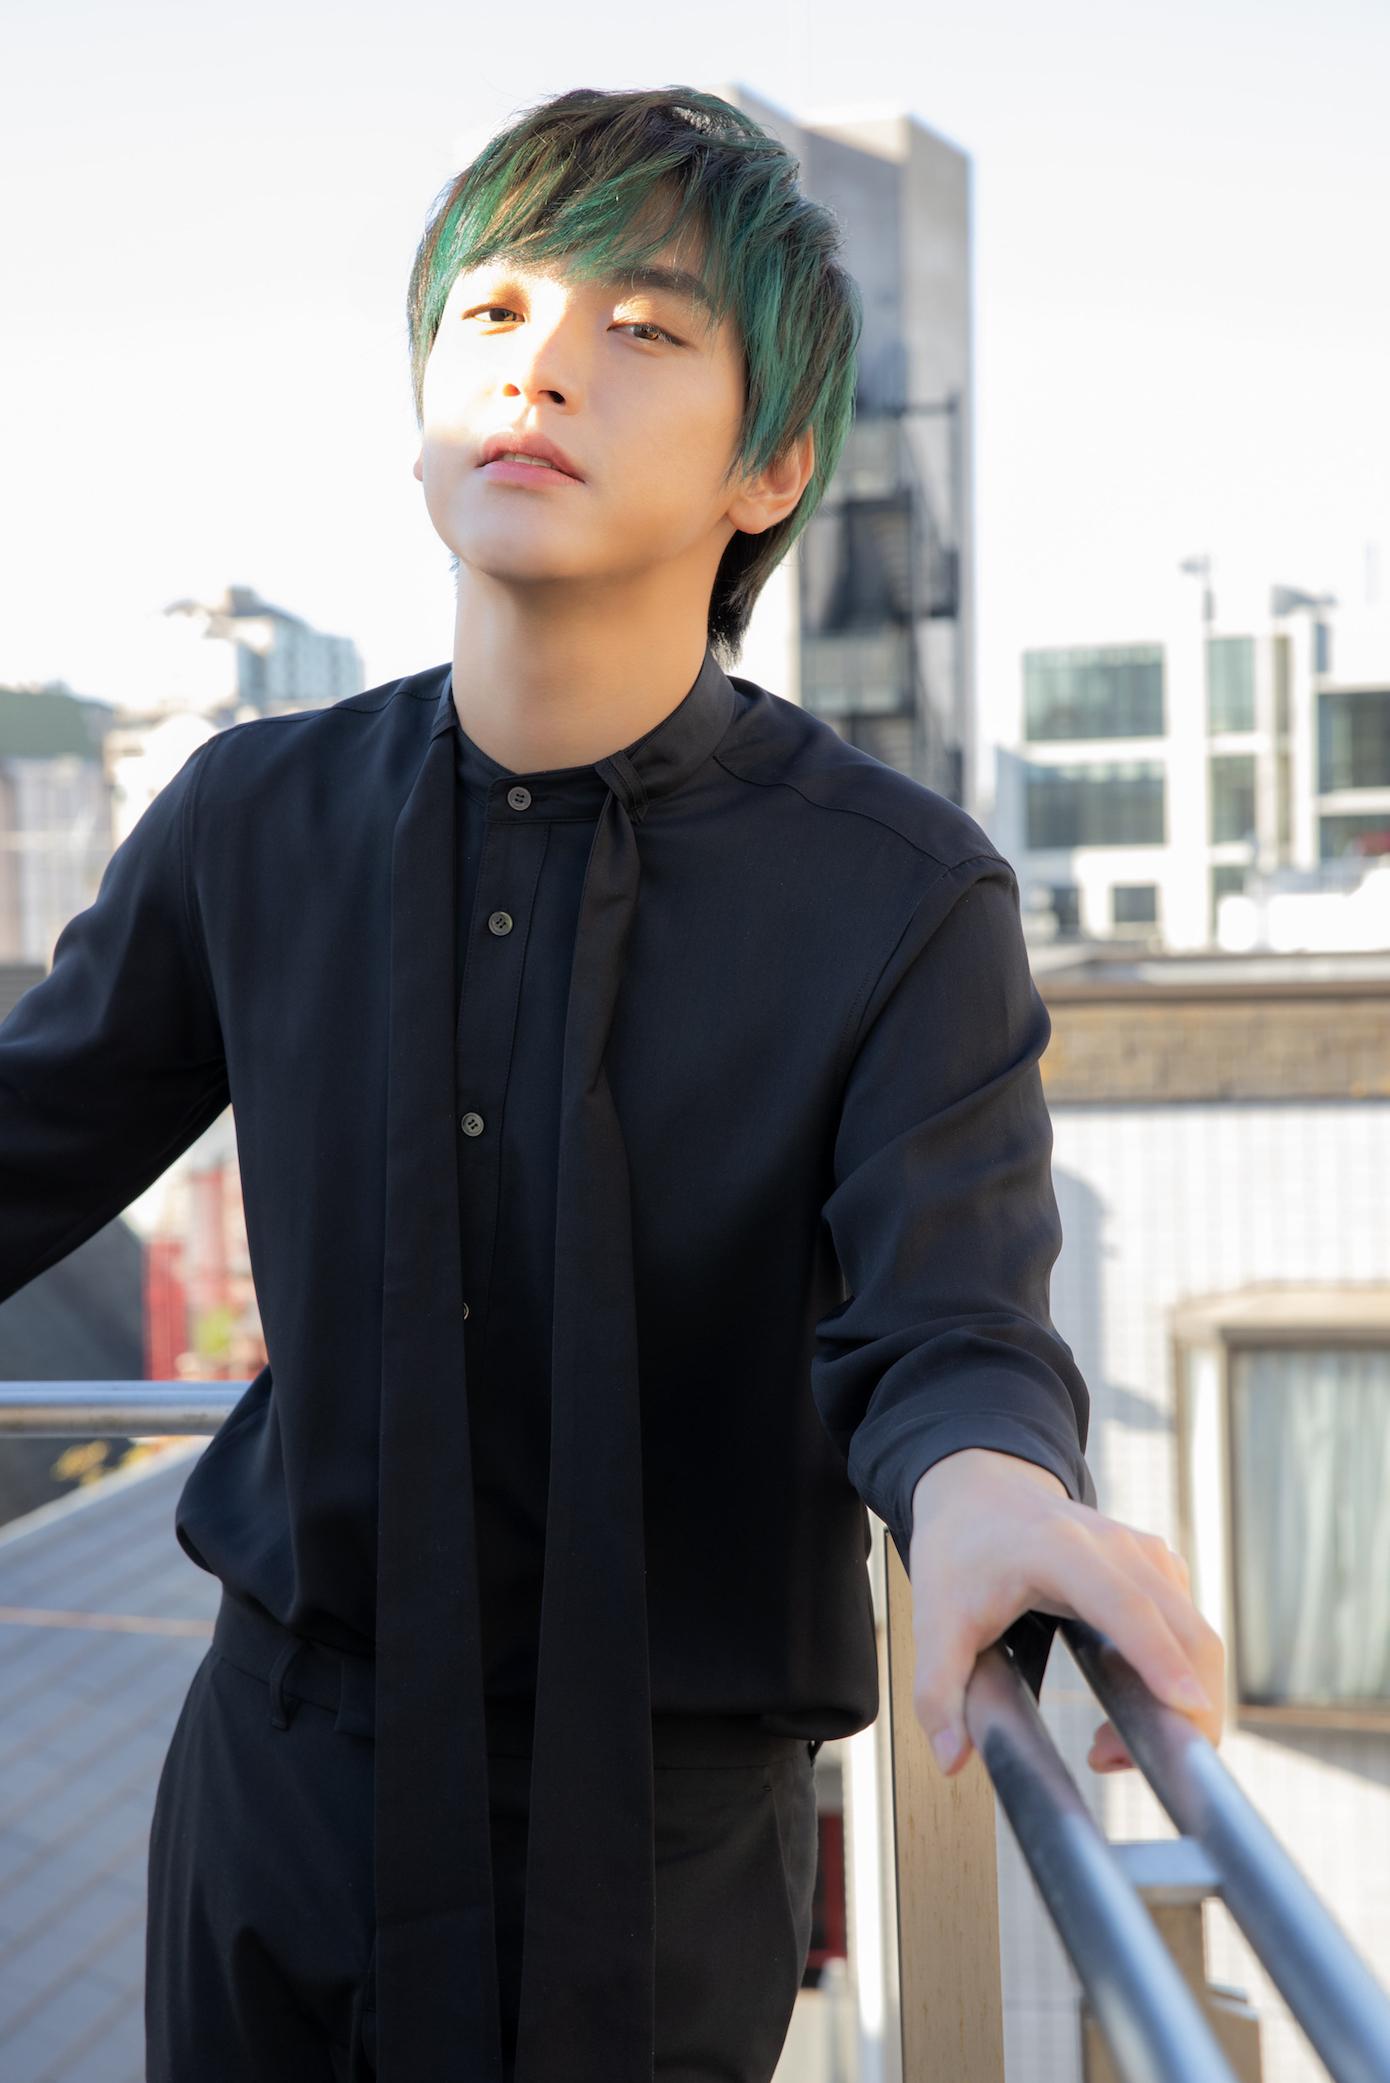 N.Flyingのジェヒョンさんが、日本のドラマ「君と世界が終わる日に」で魅力を発揮!_1_4-1